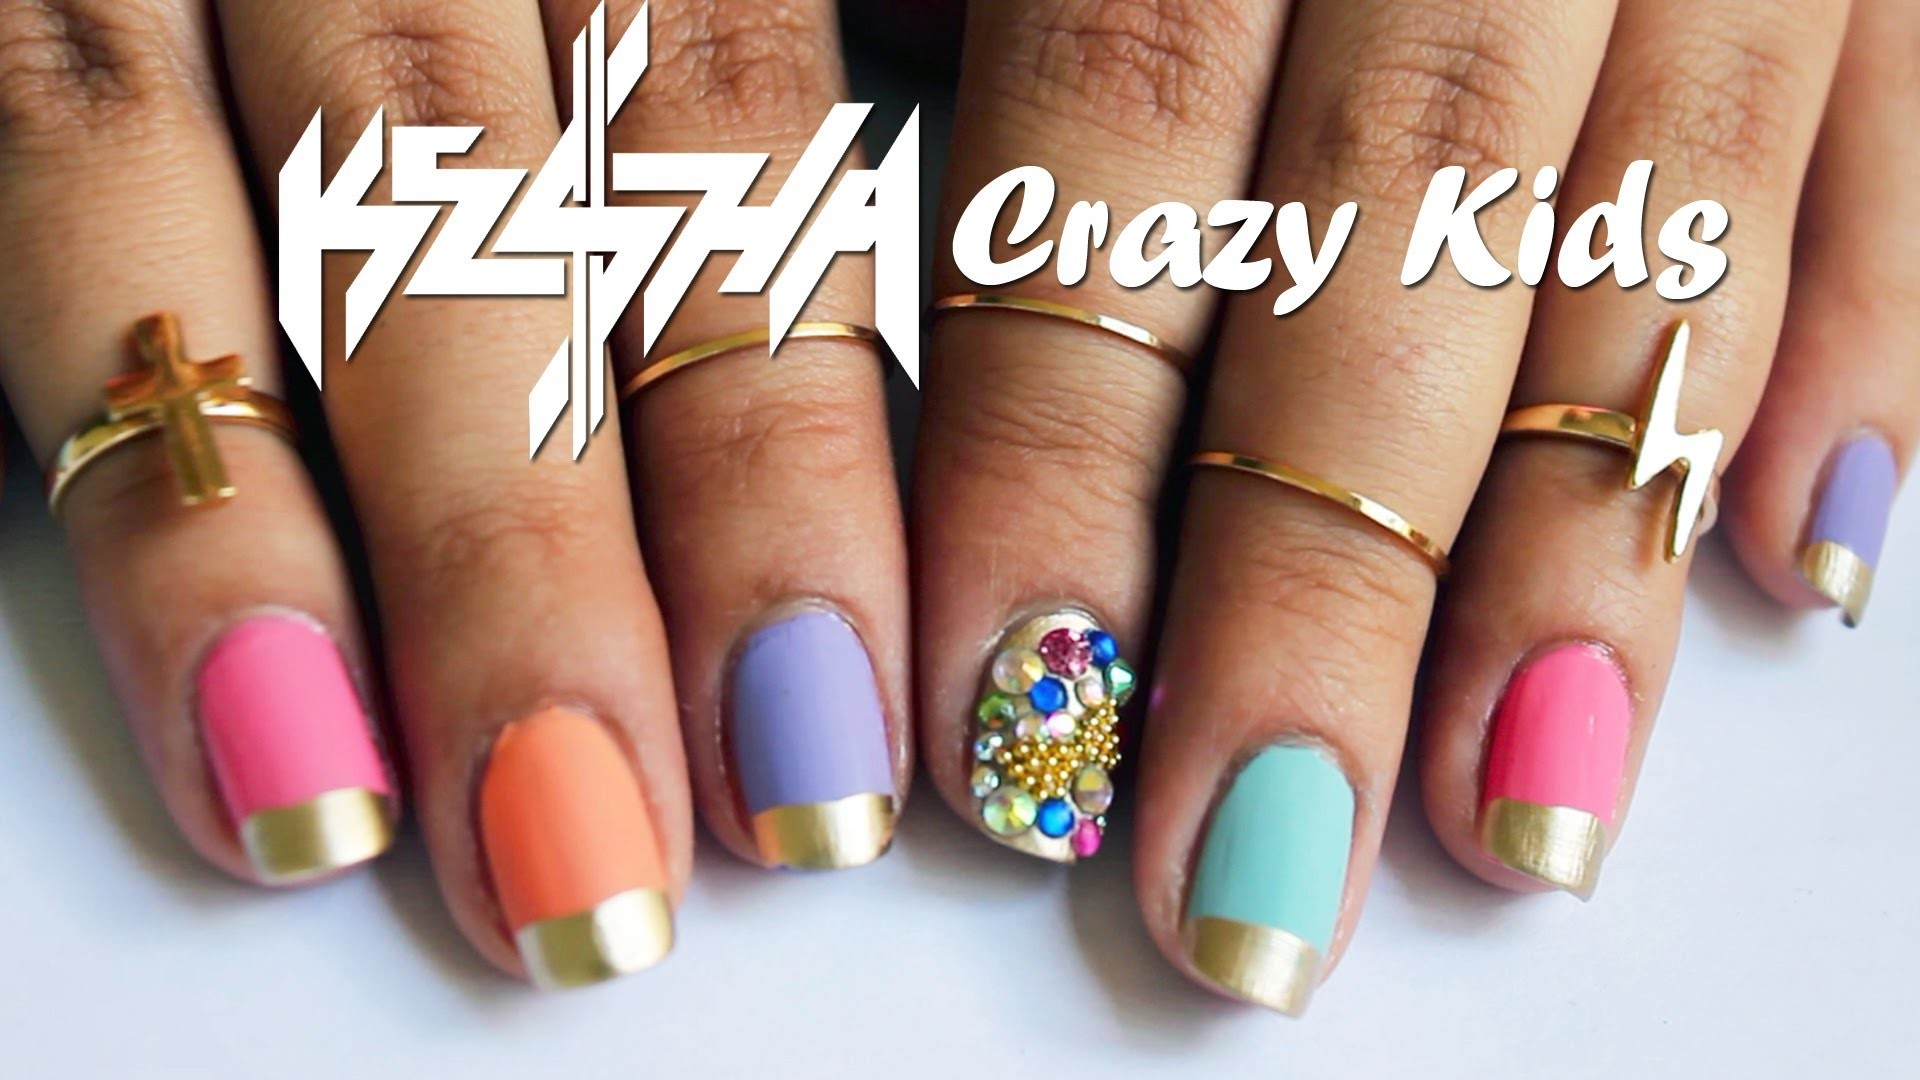 Ke$ha Crazy Kids Nails ♥ Tutorial